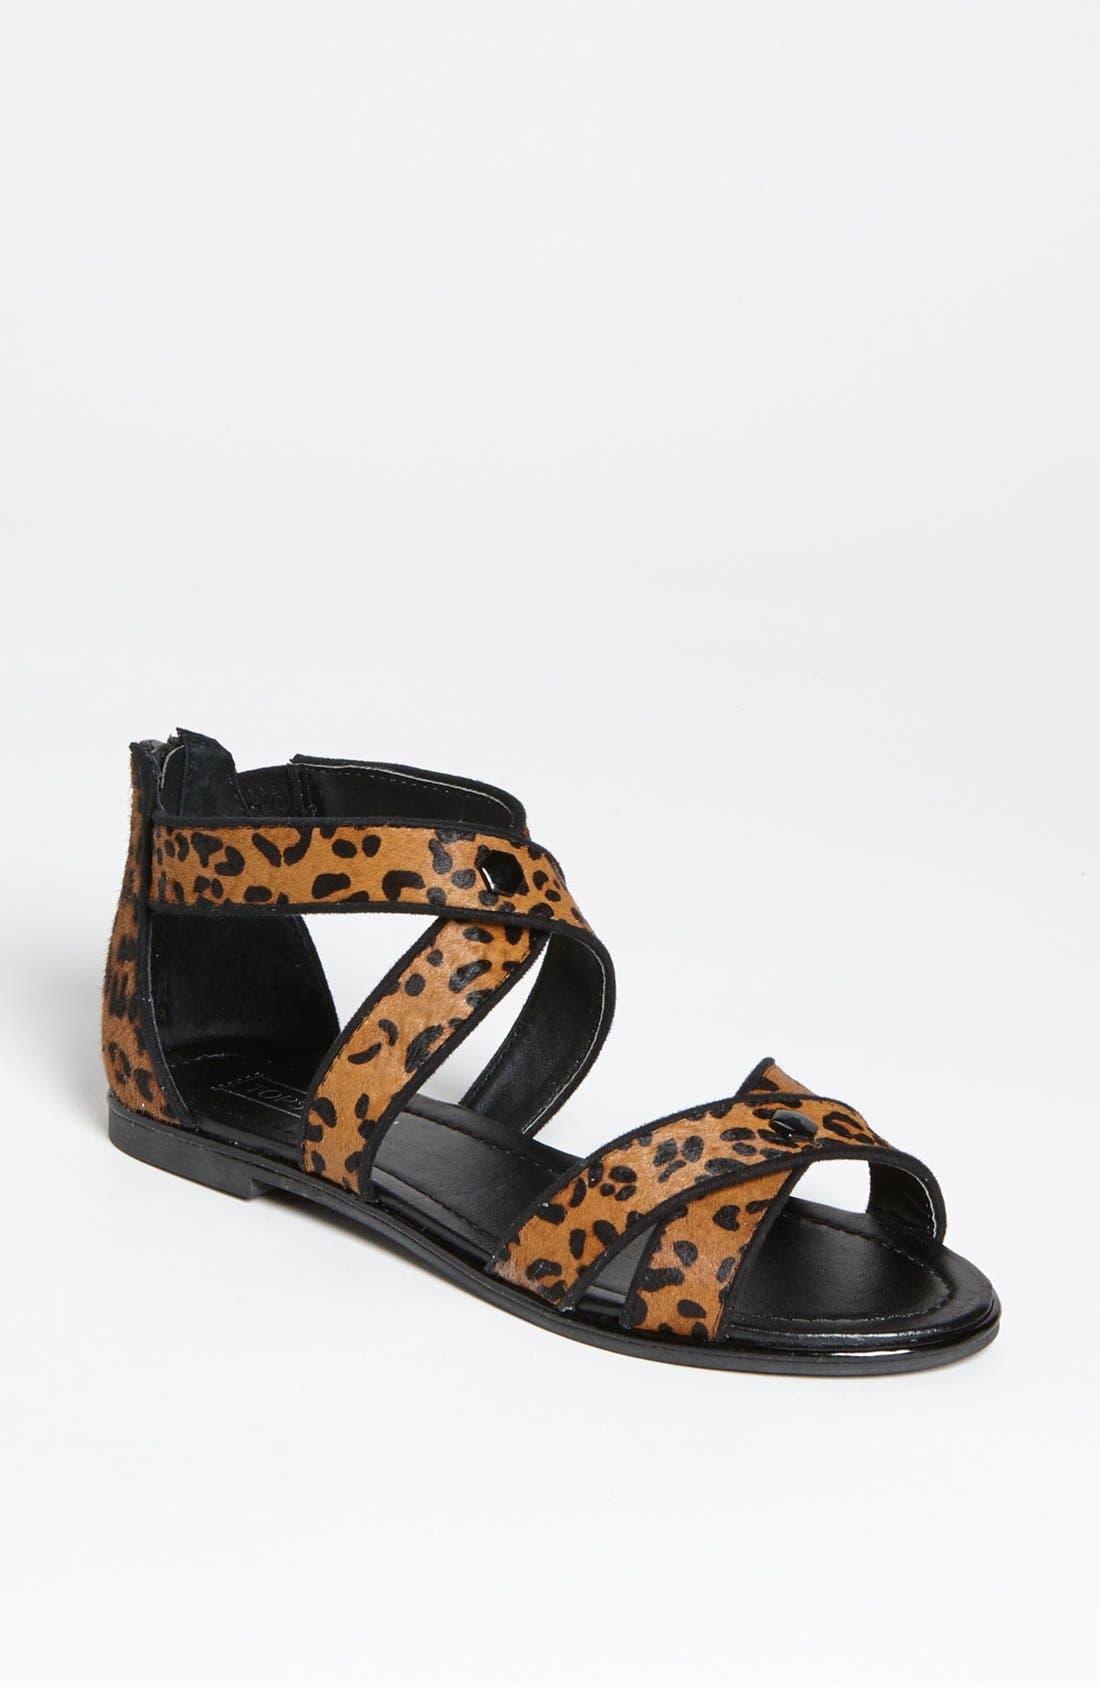 Alternate Image 1 Selected - Topshop 'Figaro' Cross Strap Sandal